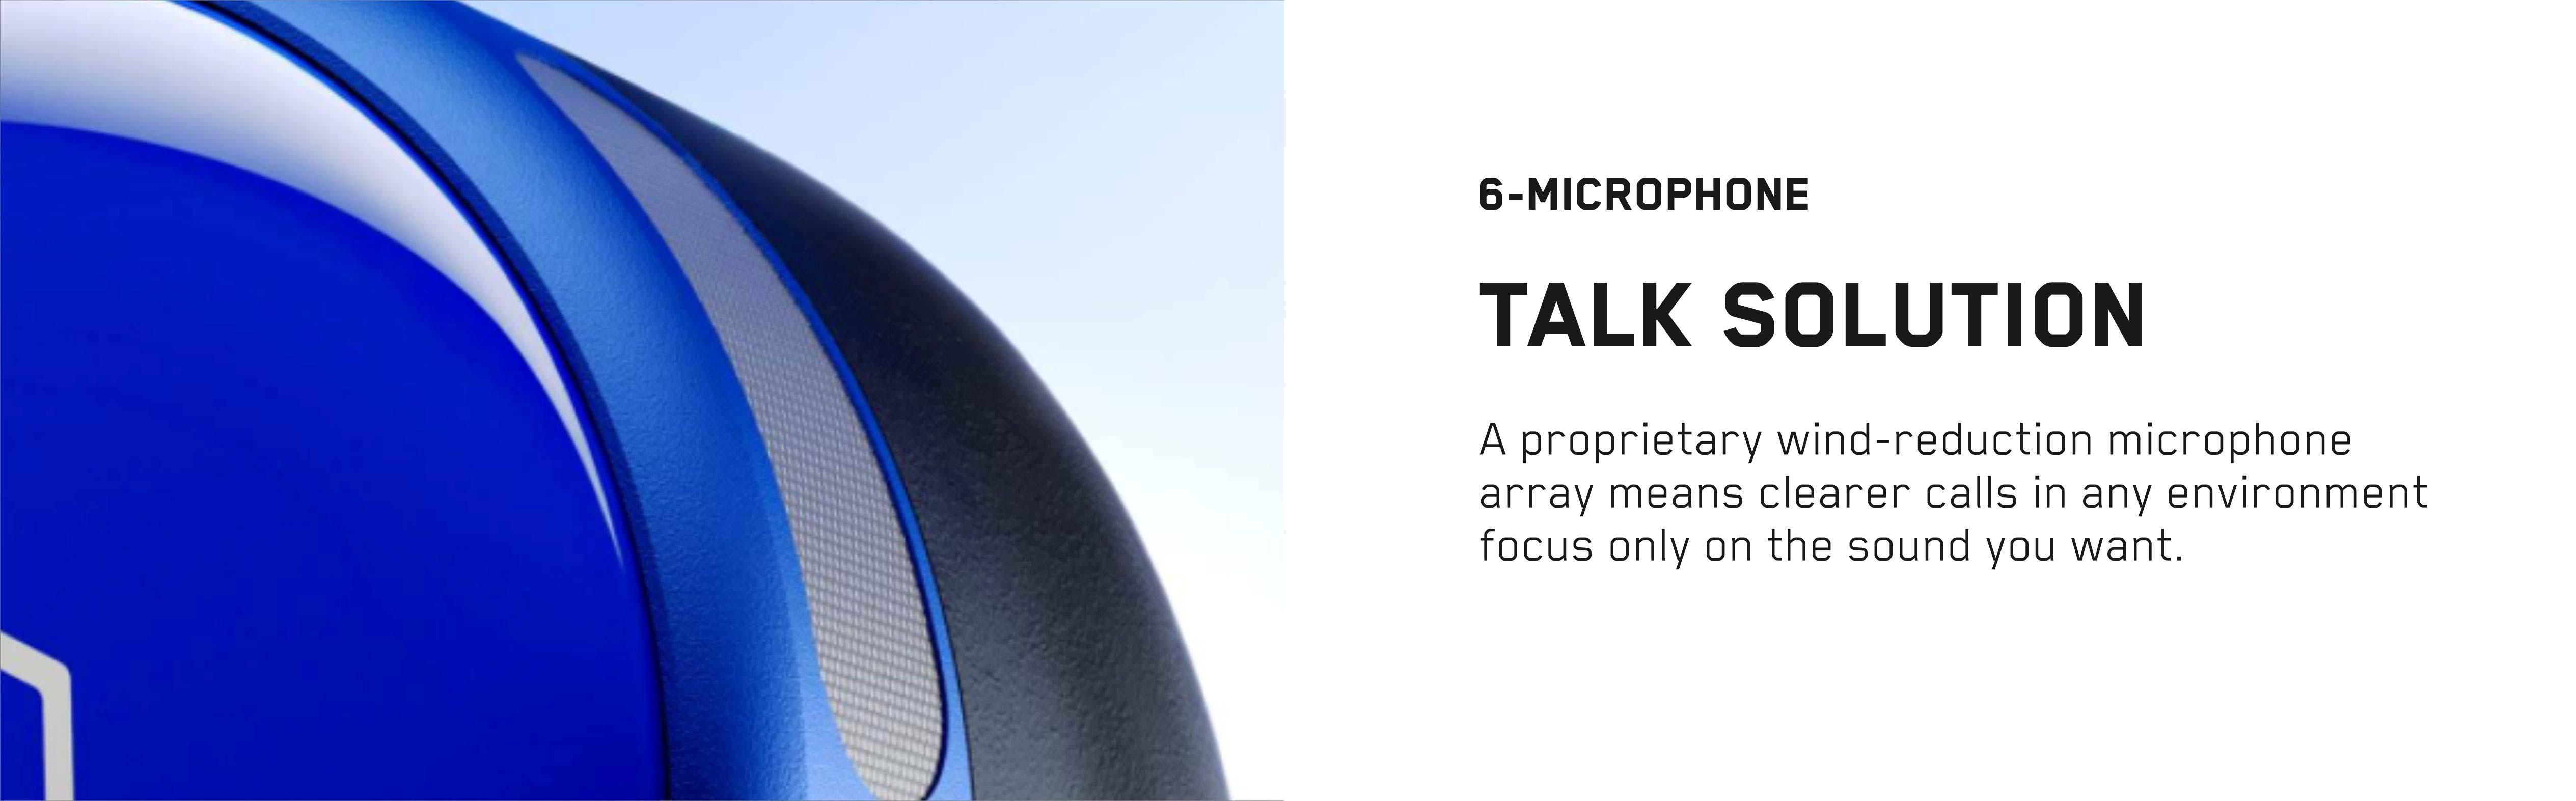 Master & Dynamic ANC True Wireless Earphones MW08 - Blue Ceramic / Polished Graphite Case